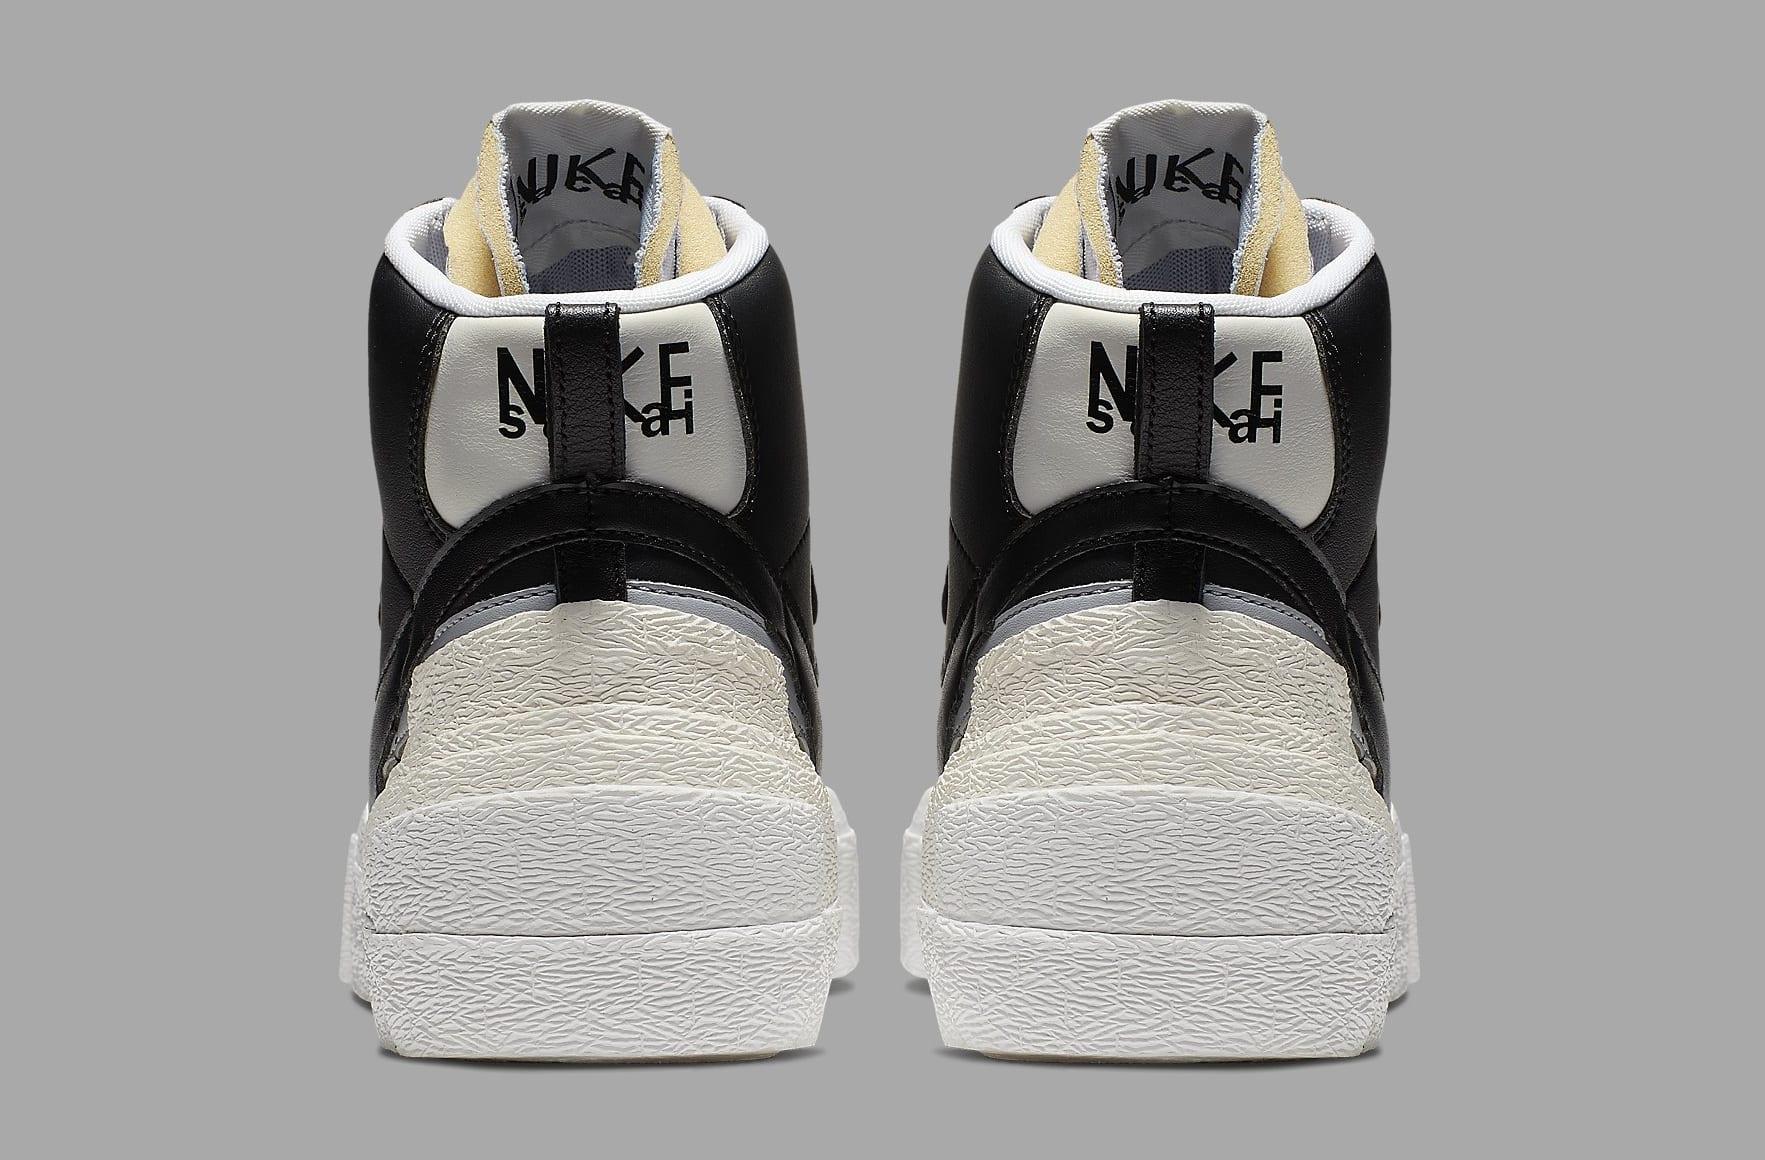 sacai-nike-blazer-mid-black-bv0072-002-heel